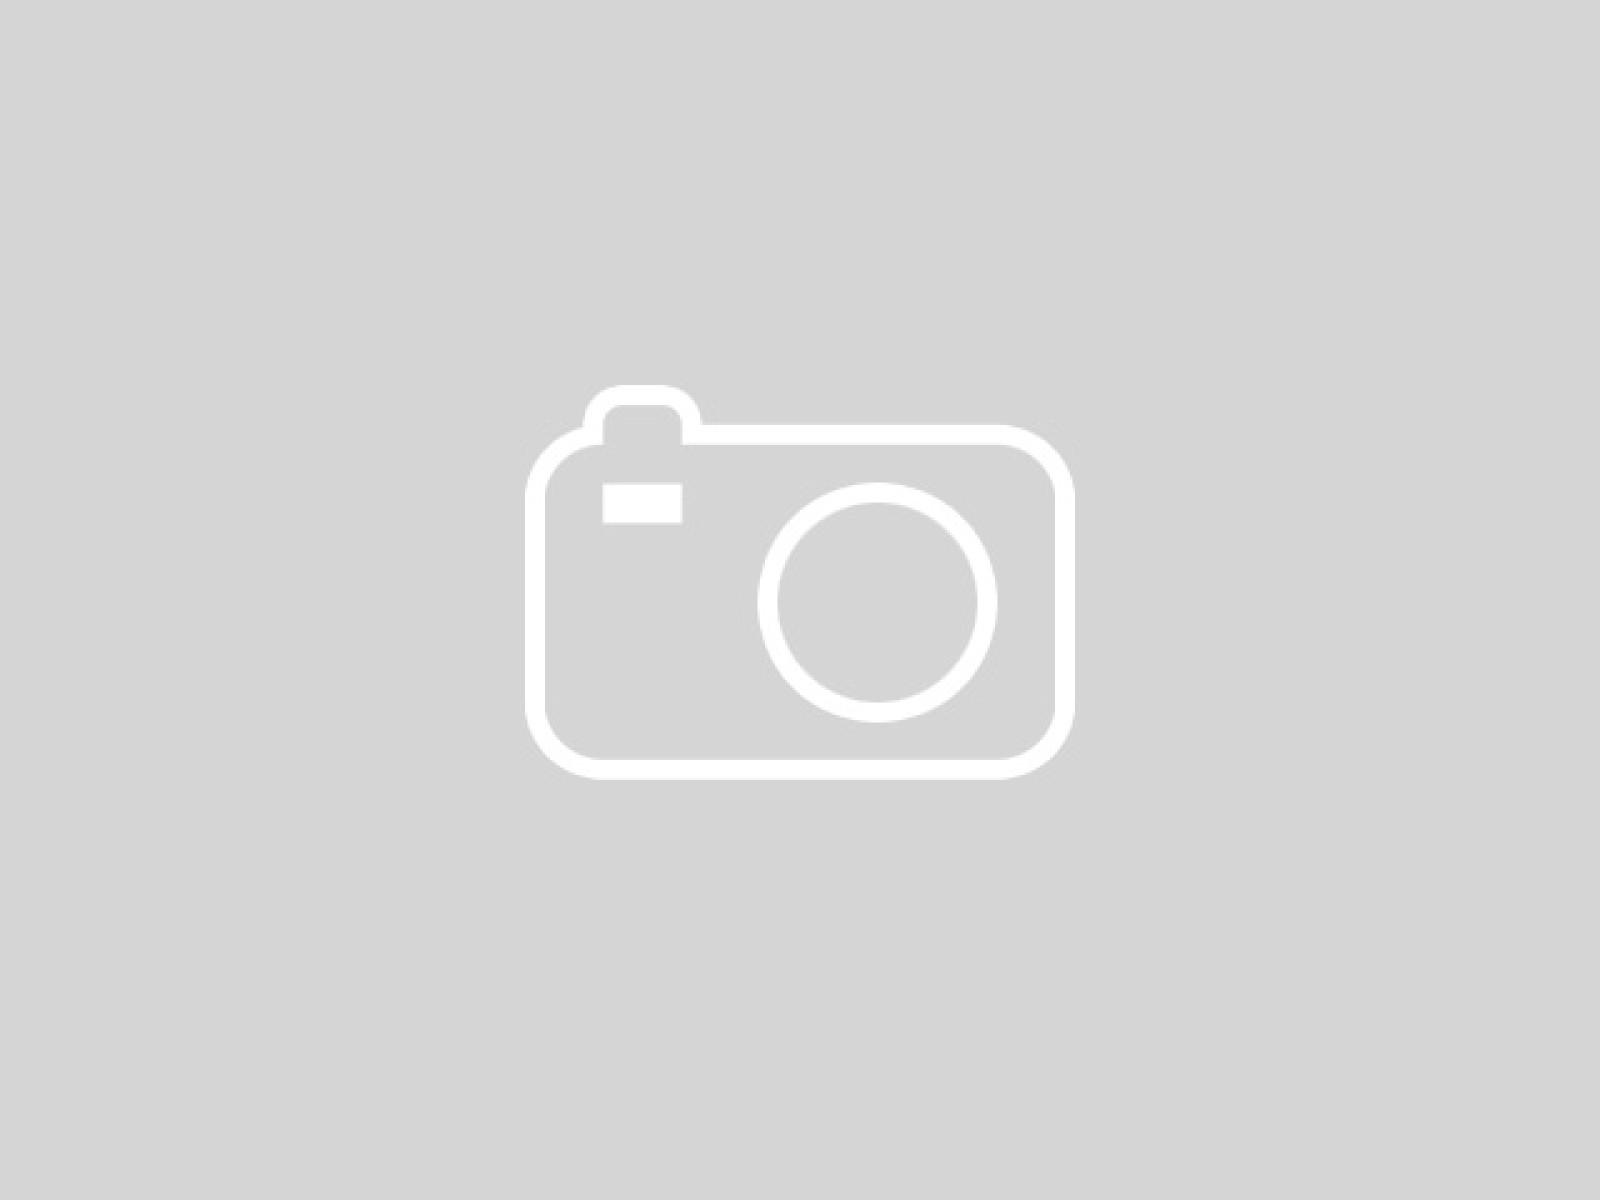 New 2021 Hyundai Kona 1.6T Ultimate AWD